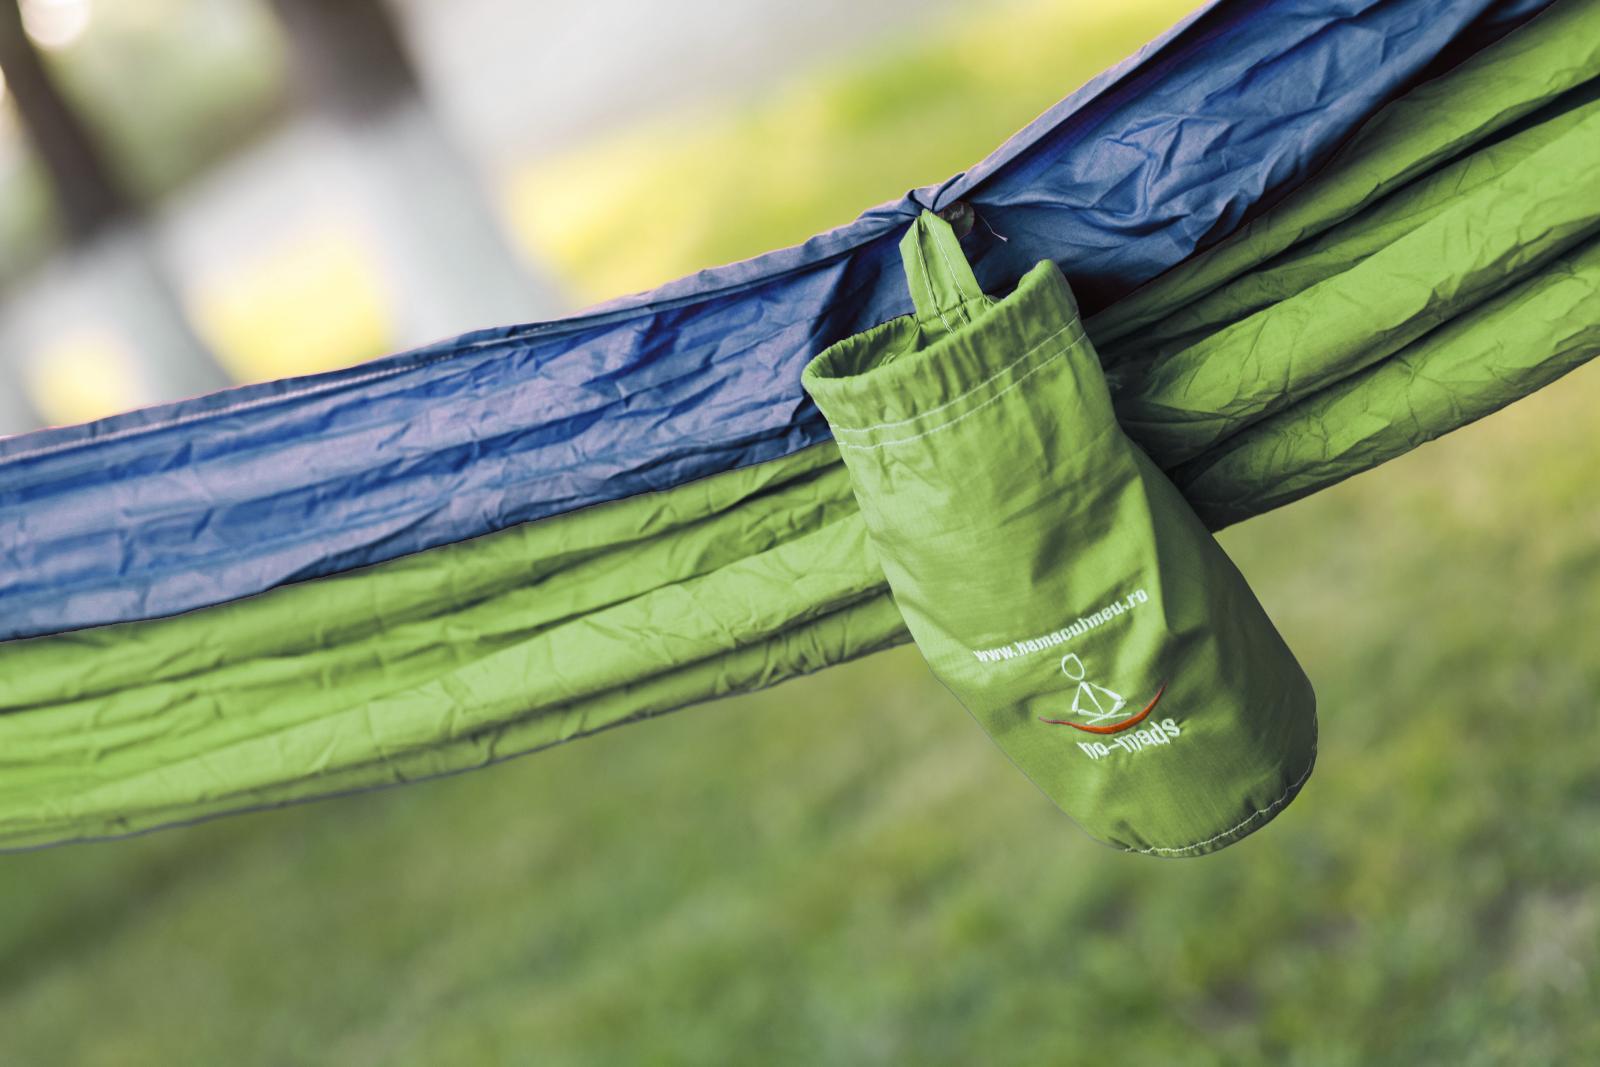 hamac ripstop green-blue detaliu